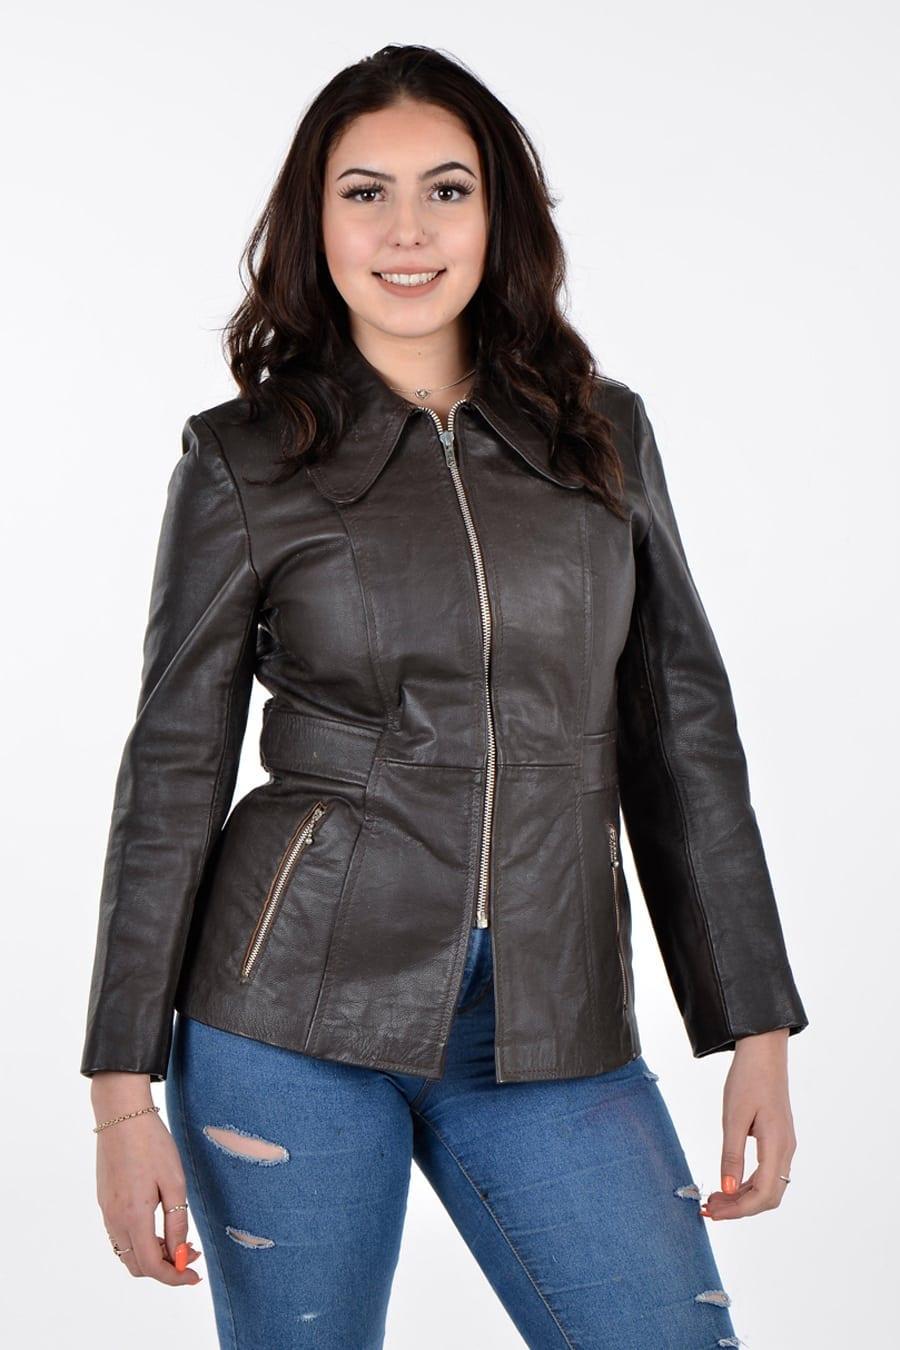 Vintage women's brown leather jacket